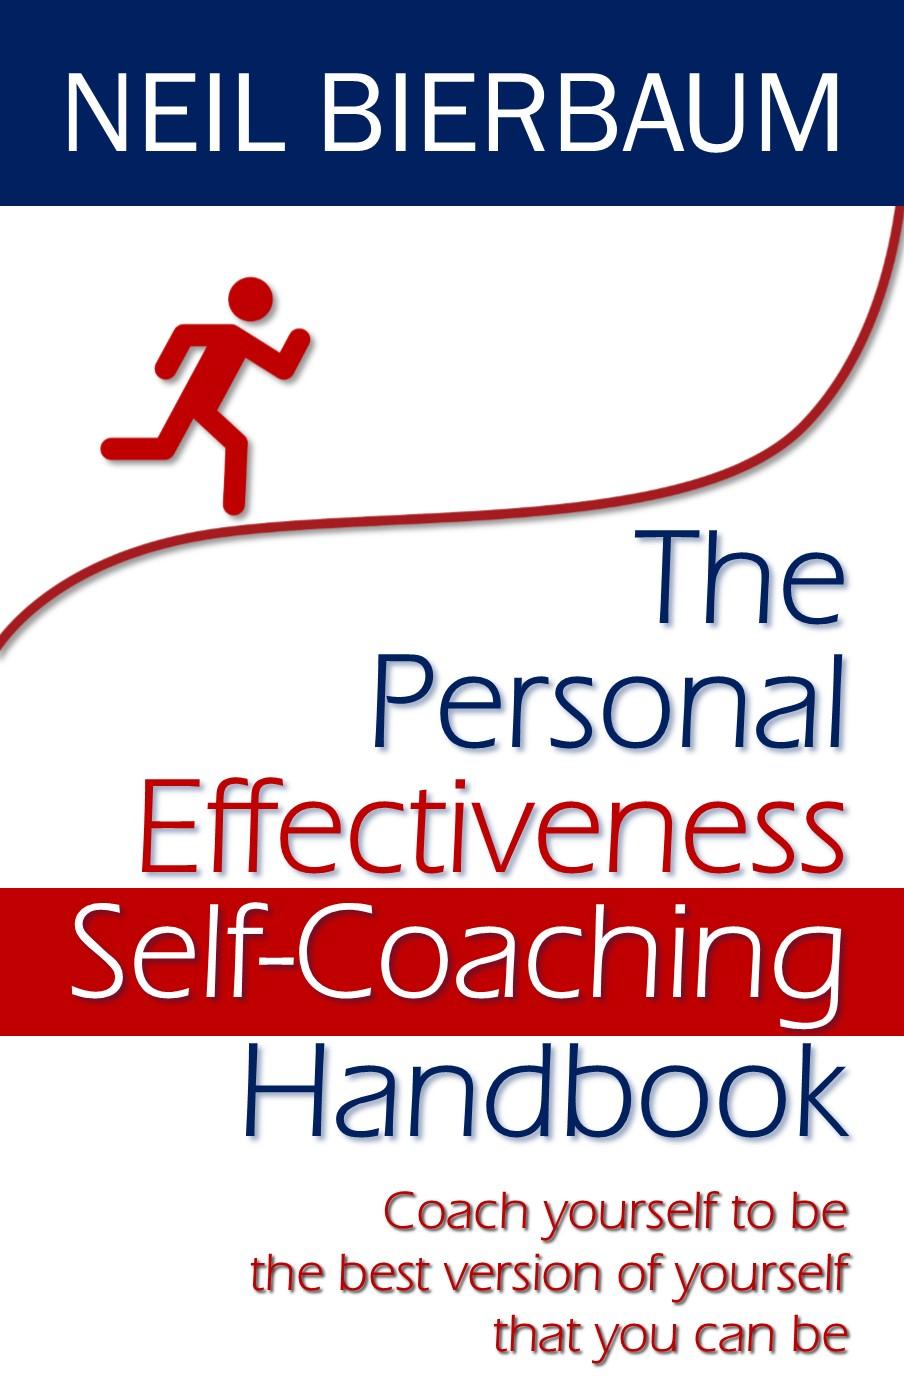 neil bierbaum books personal effectiveness self-coaching handbook